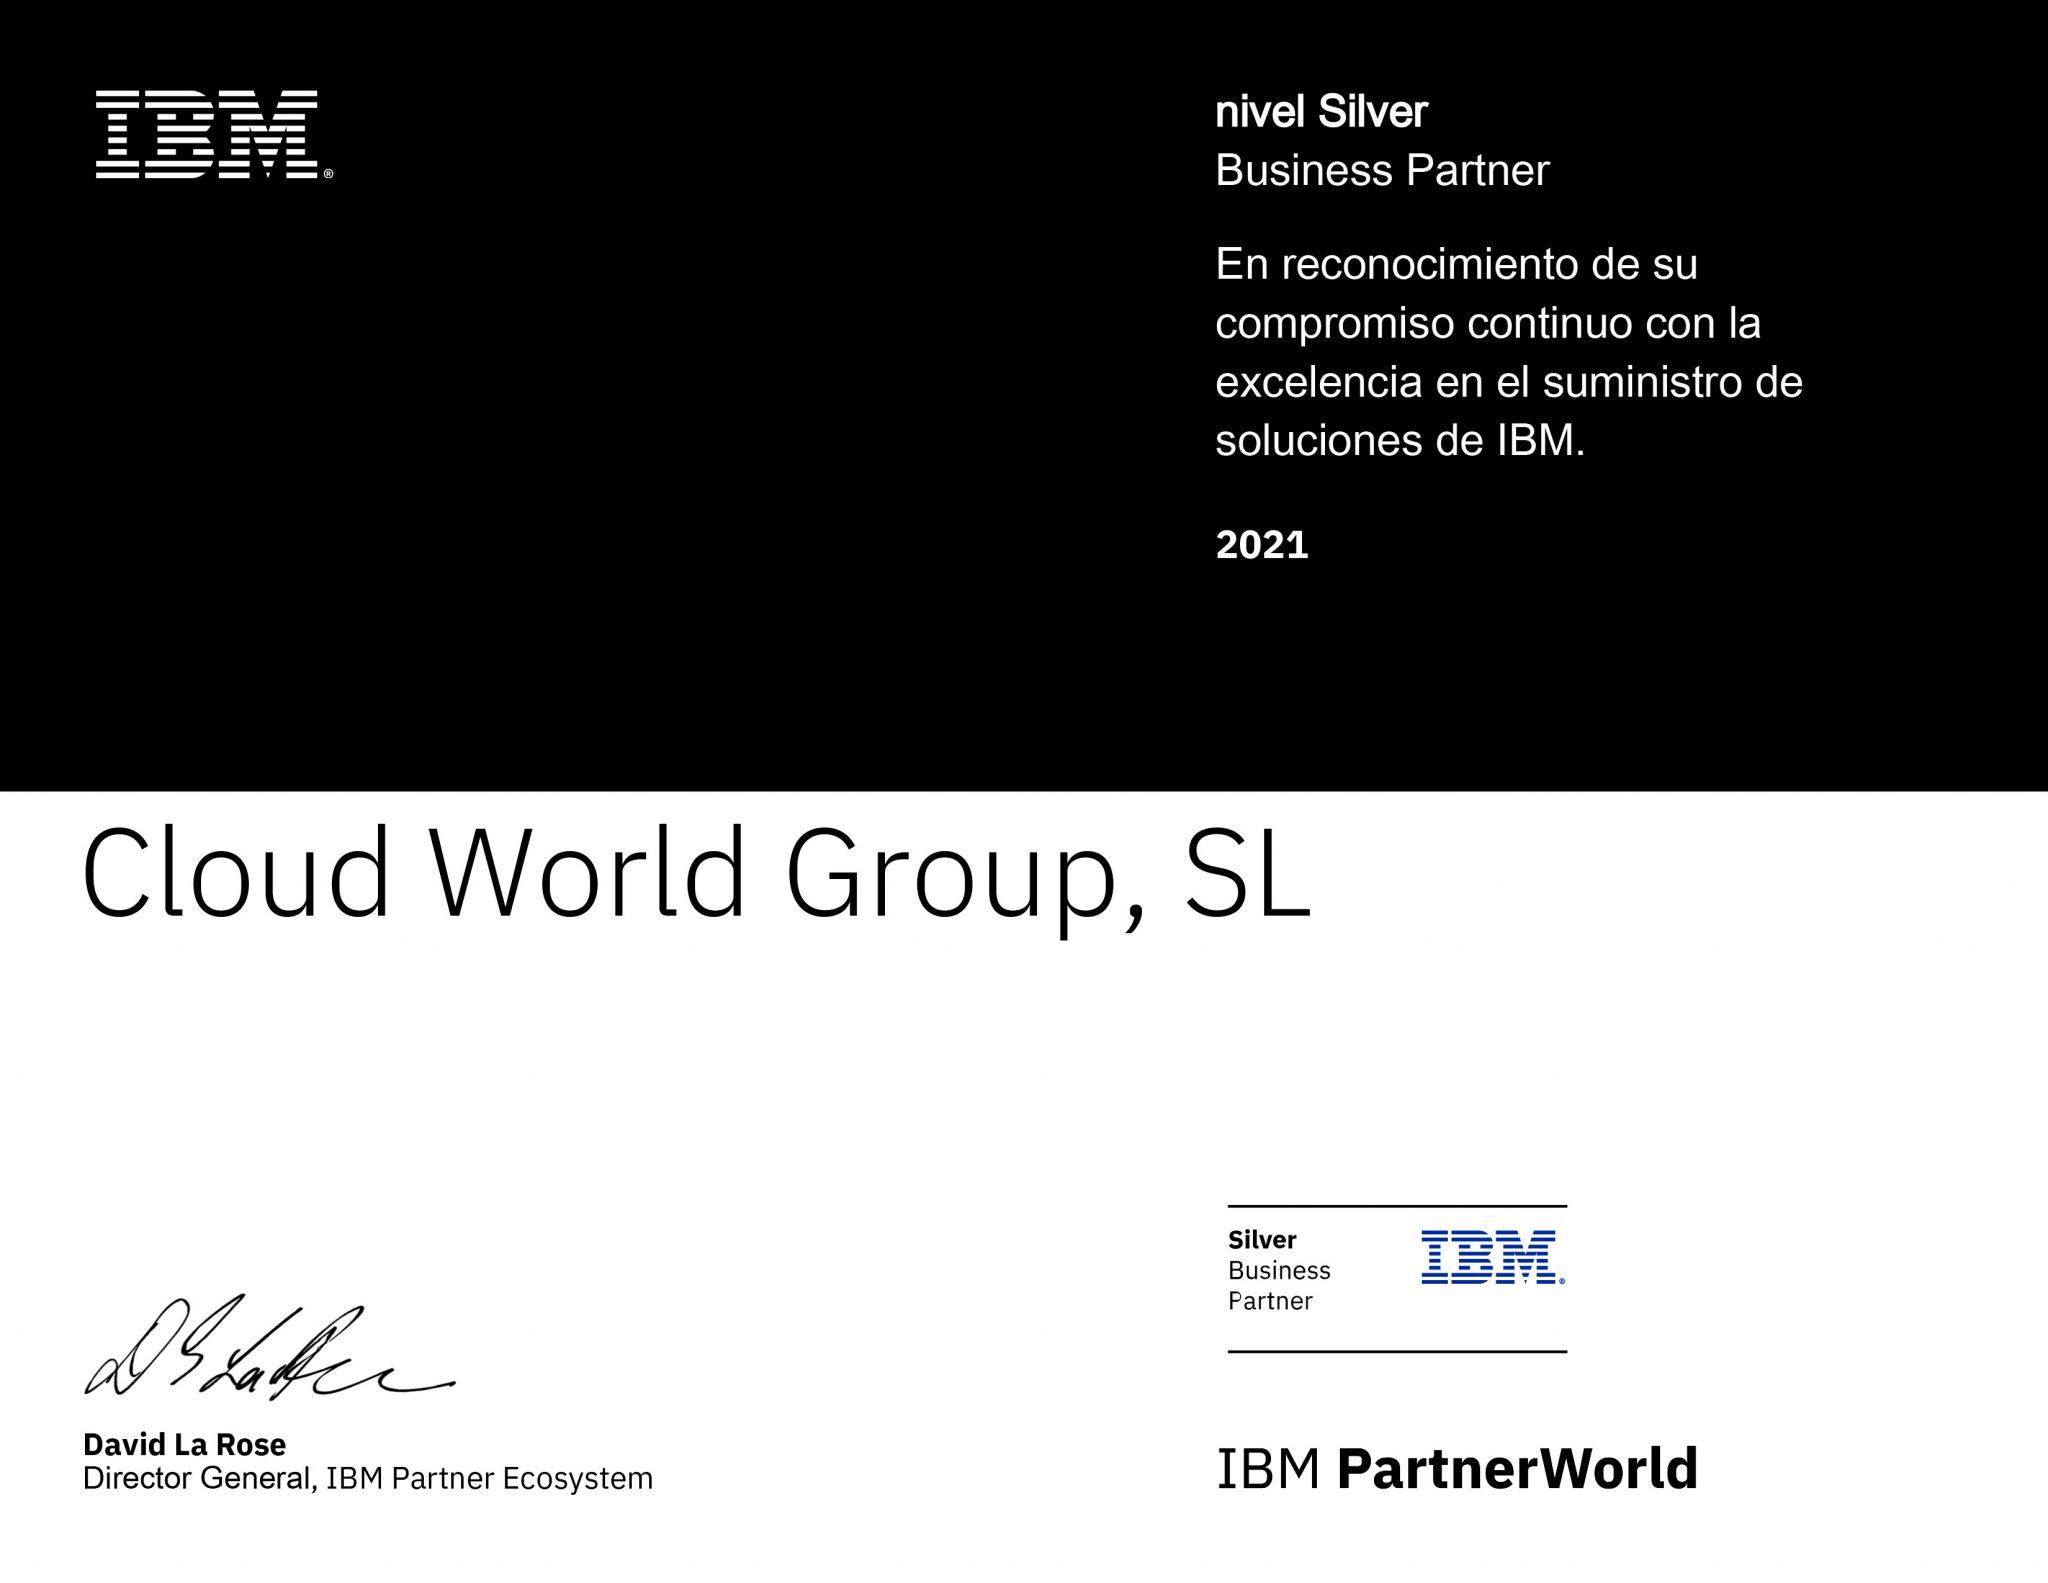 ibm certificado